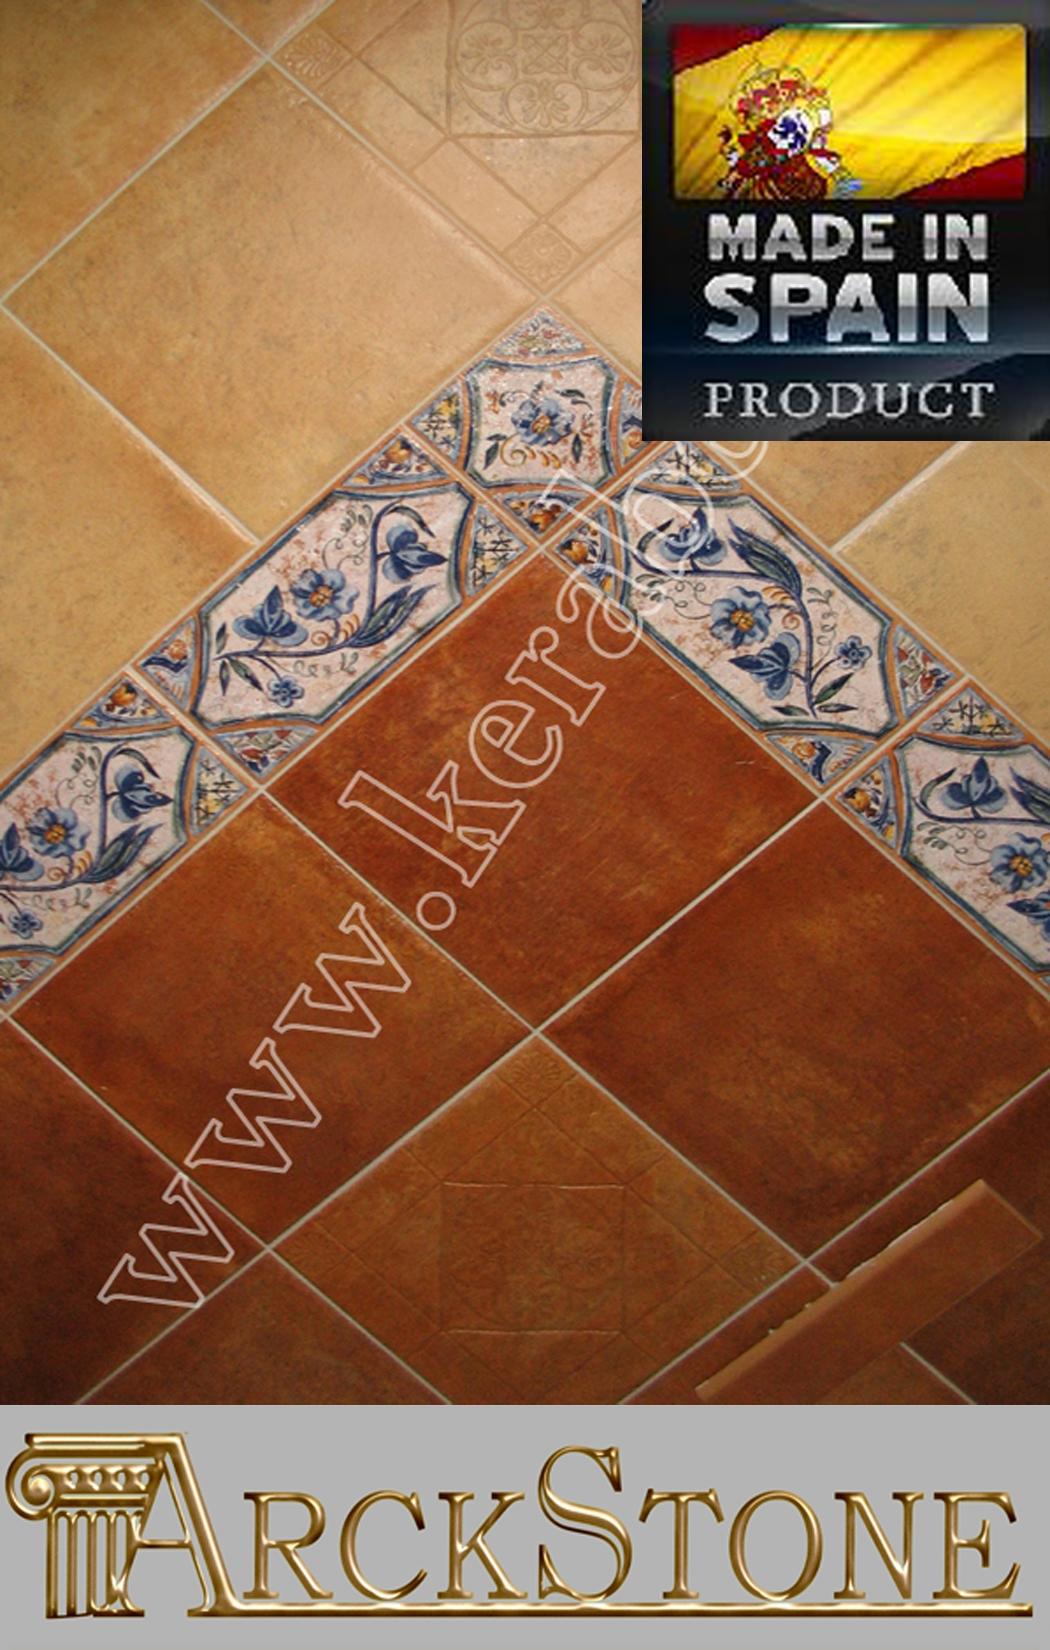 Arckstone piastrelle pavimento in gres porcellanato cotto keraben jacobeo olite ebay - Pavimento effetto bagnato ...